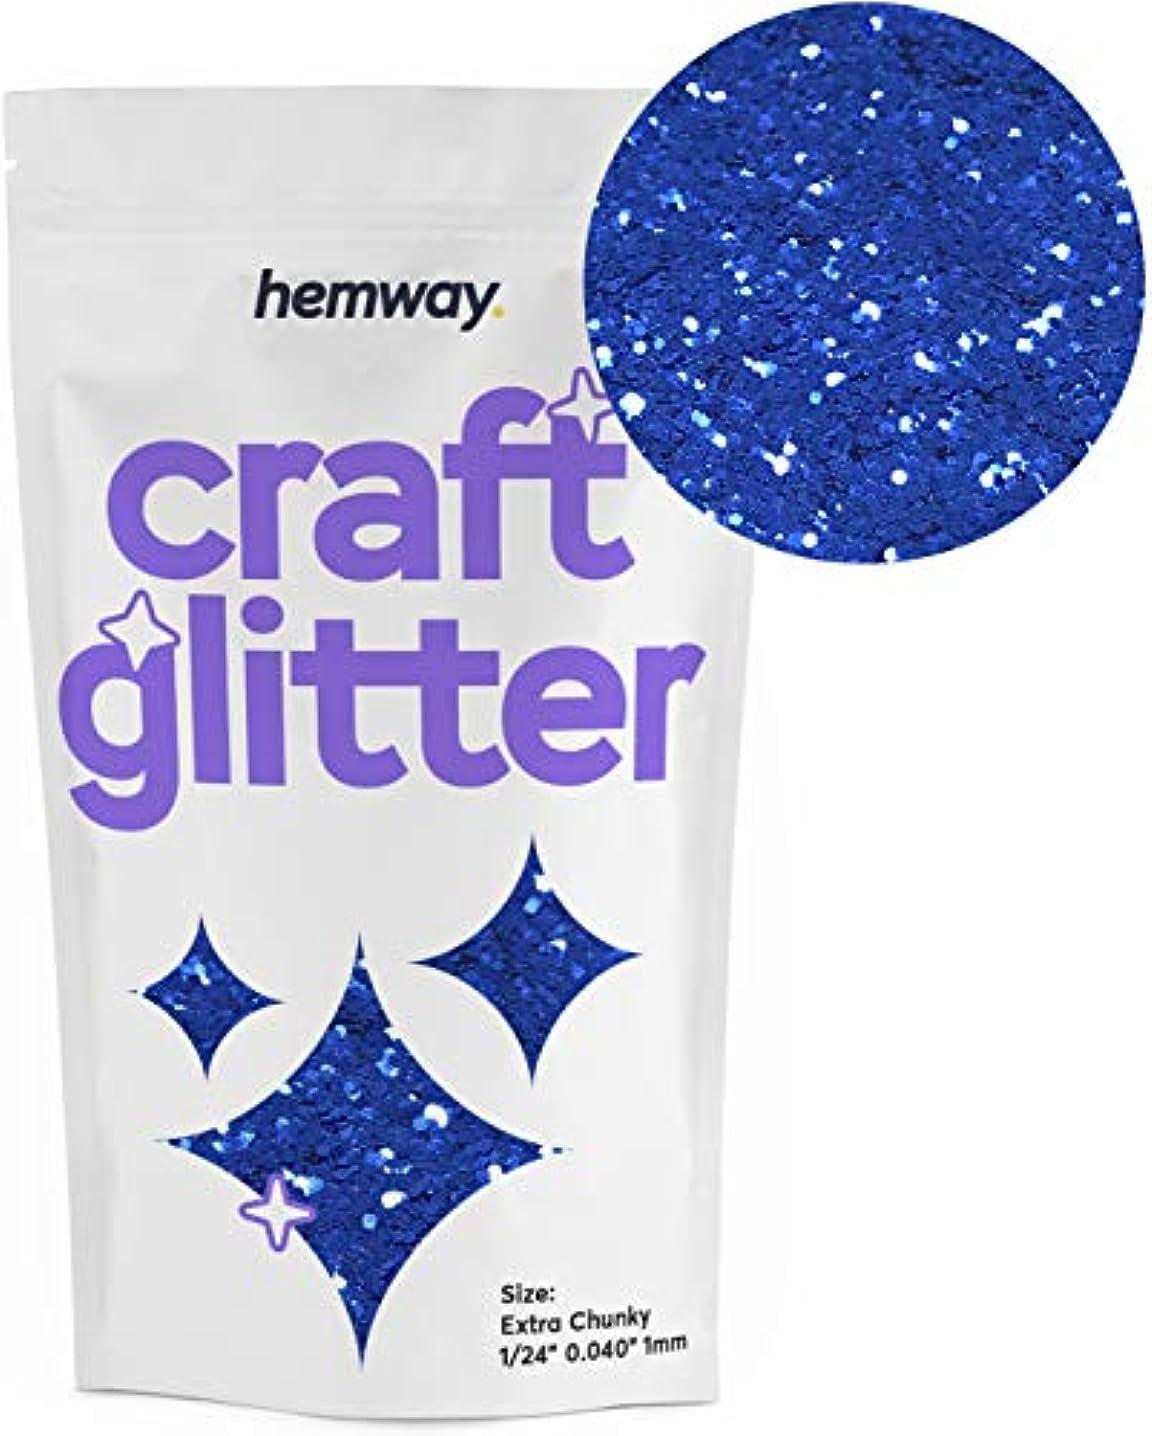 Hemway Craft Glitter 100g 3.5oz Extra Chunky 1/24